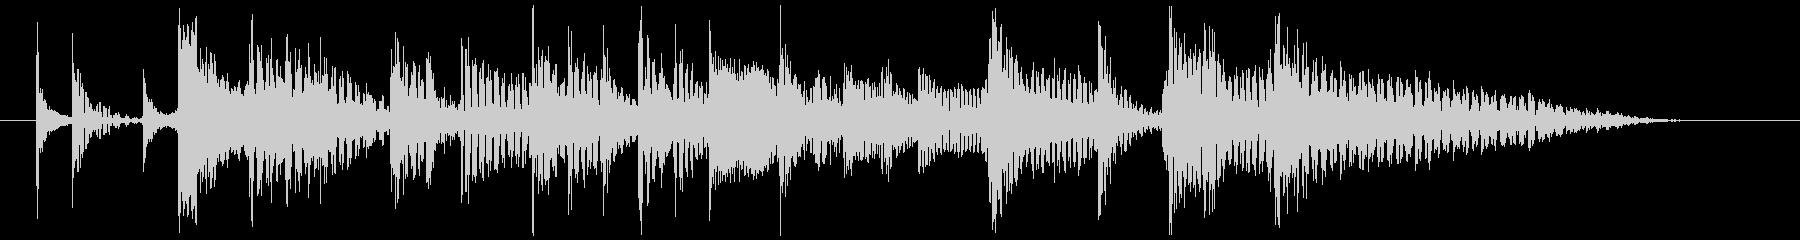 80's ニューウェイブ風ジングル2の未再生の波形